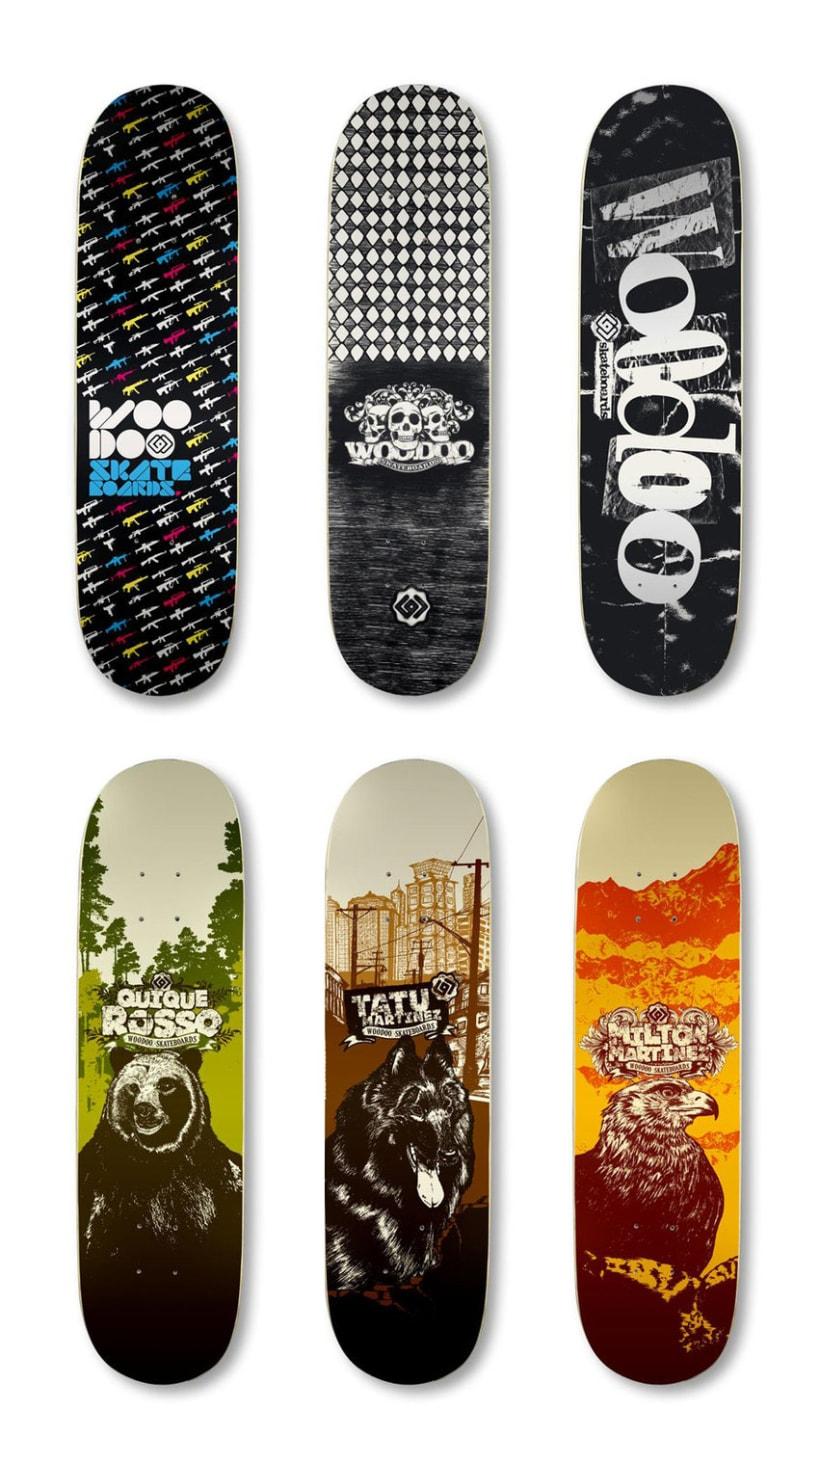 Woodoo Decks 1